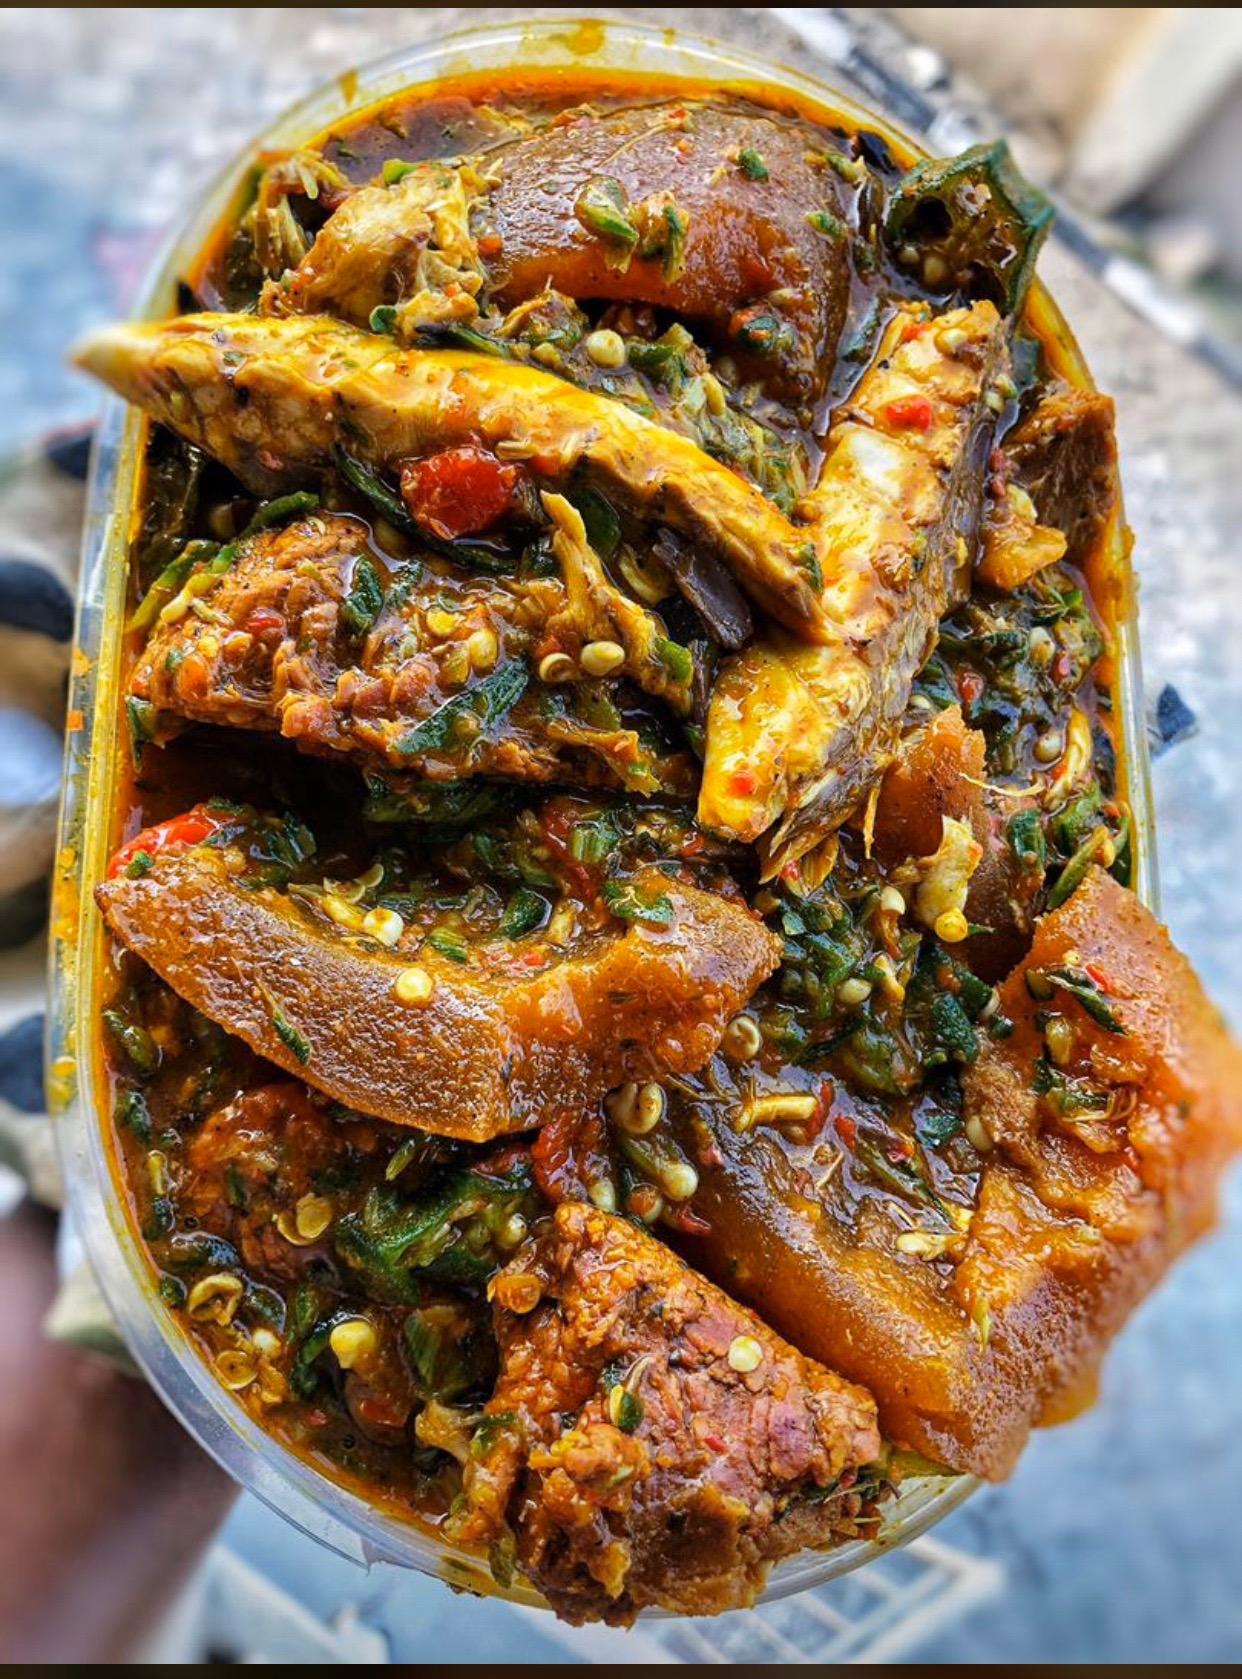 #cookingrecipehq  okra soup for dinner🤩🤩 ingredients-okra-palmoil-water-salt-seasoning-vegetable leave -pepper-crayfish-Pomo -smoked fish -meat